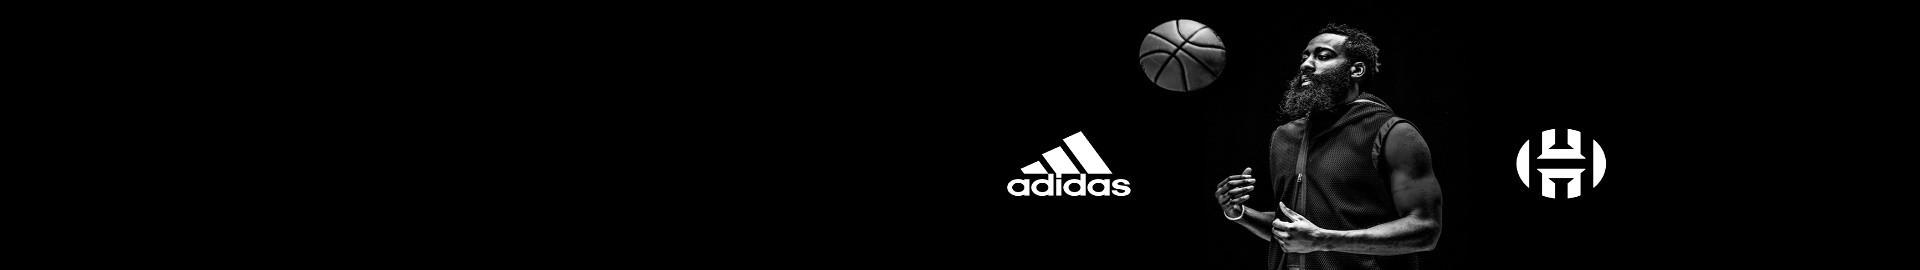 Scarpe Adidas da Basket Uomo/Donna/Bambino | Basket Zone Siena